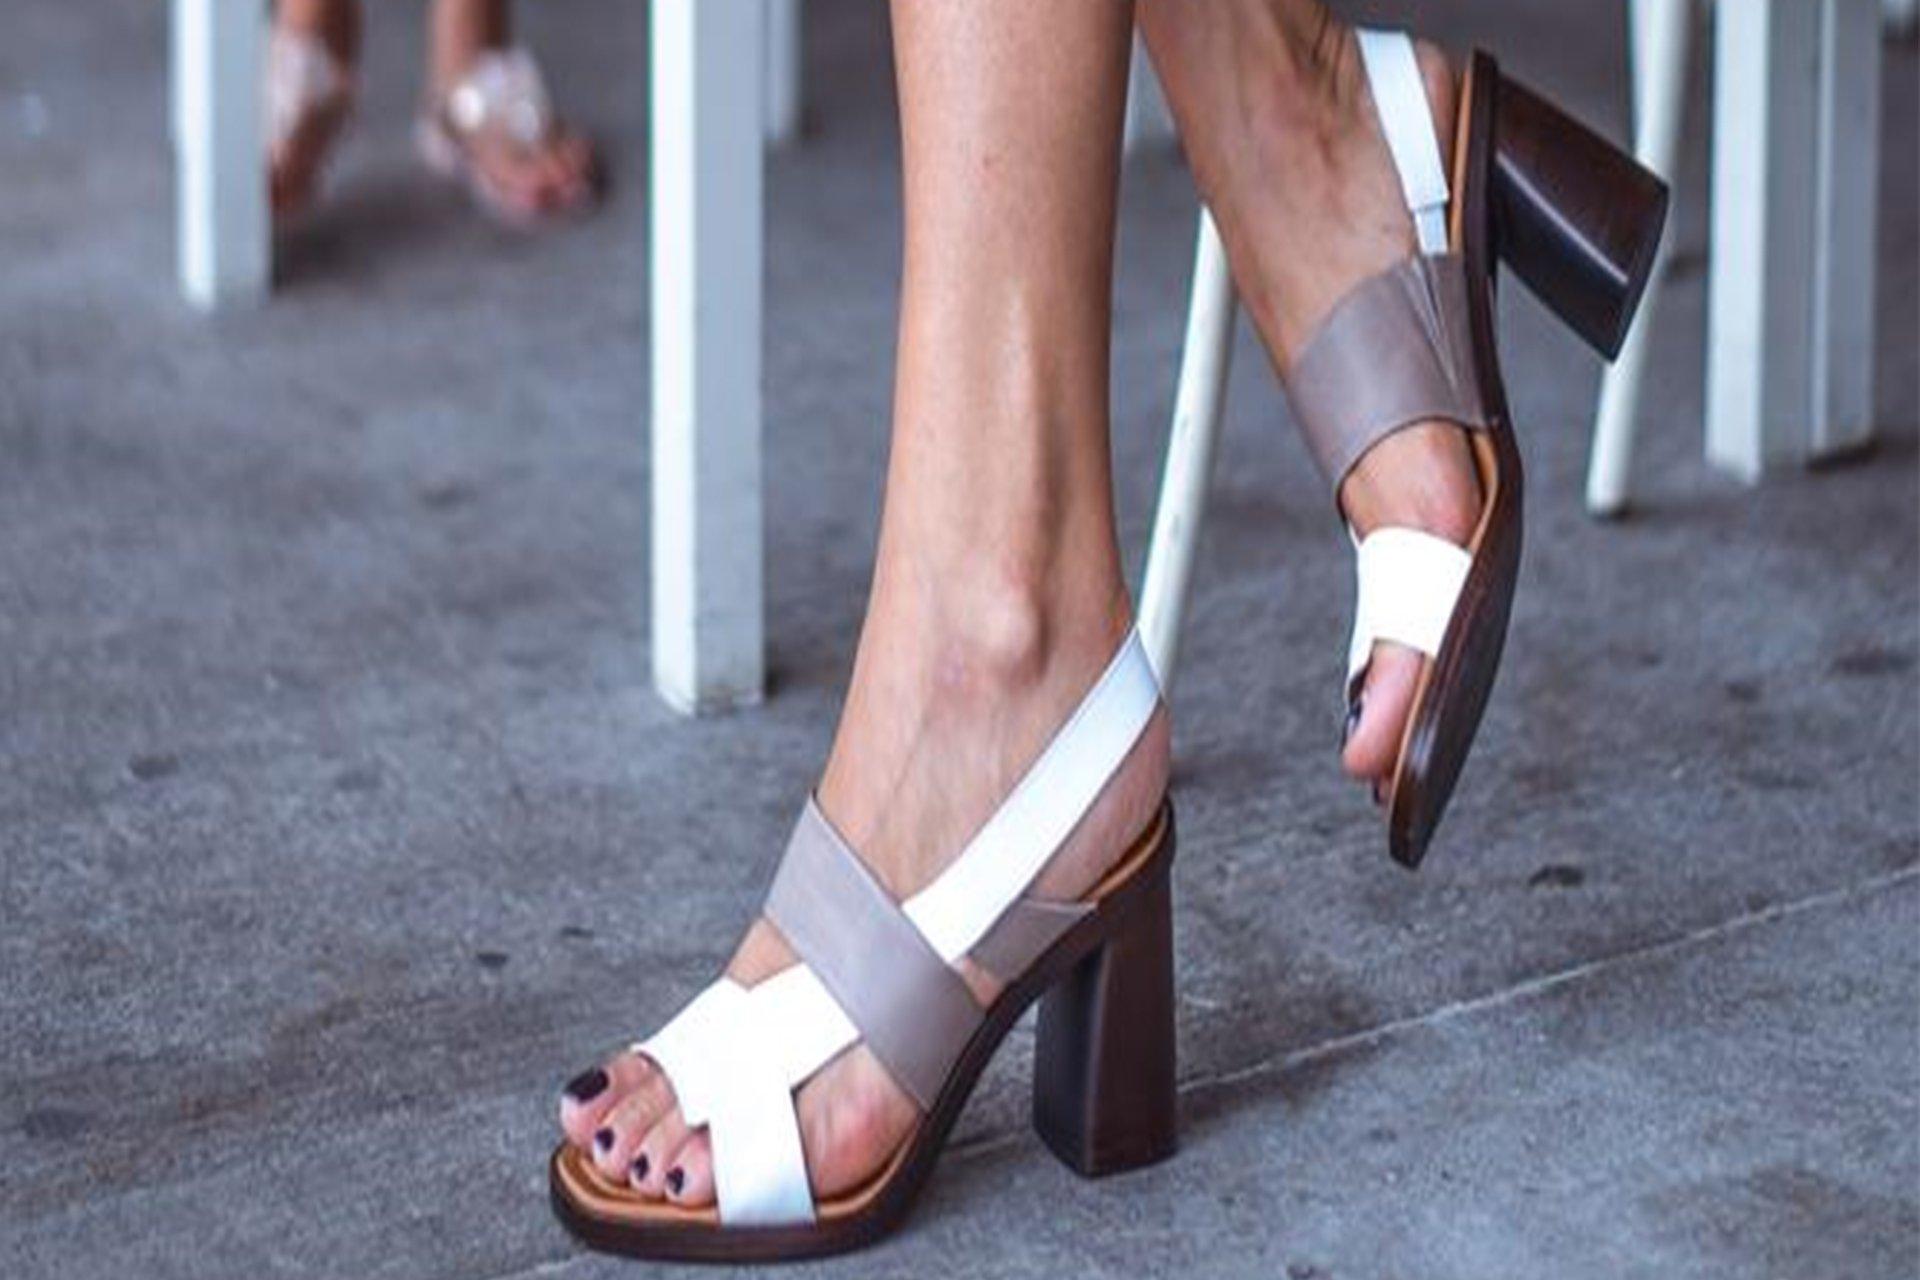 La scarpa alta e comoda Melluso Crumbs of Life